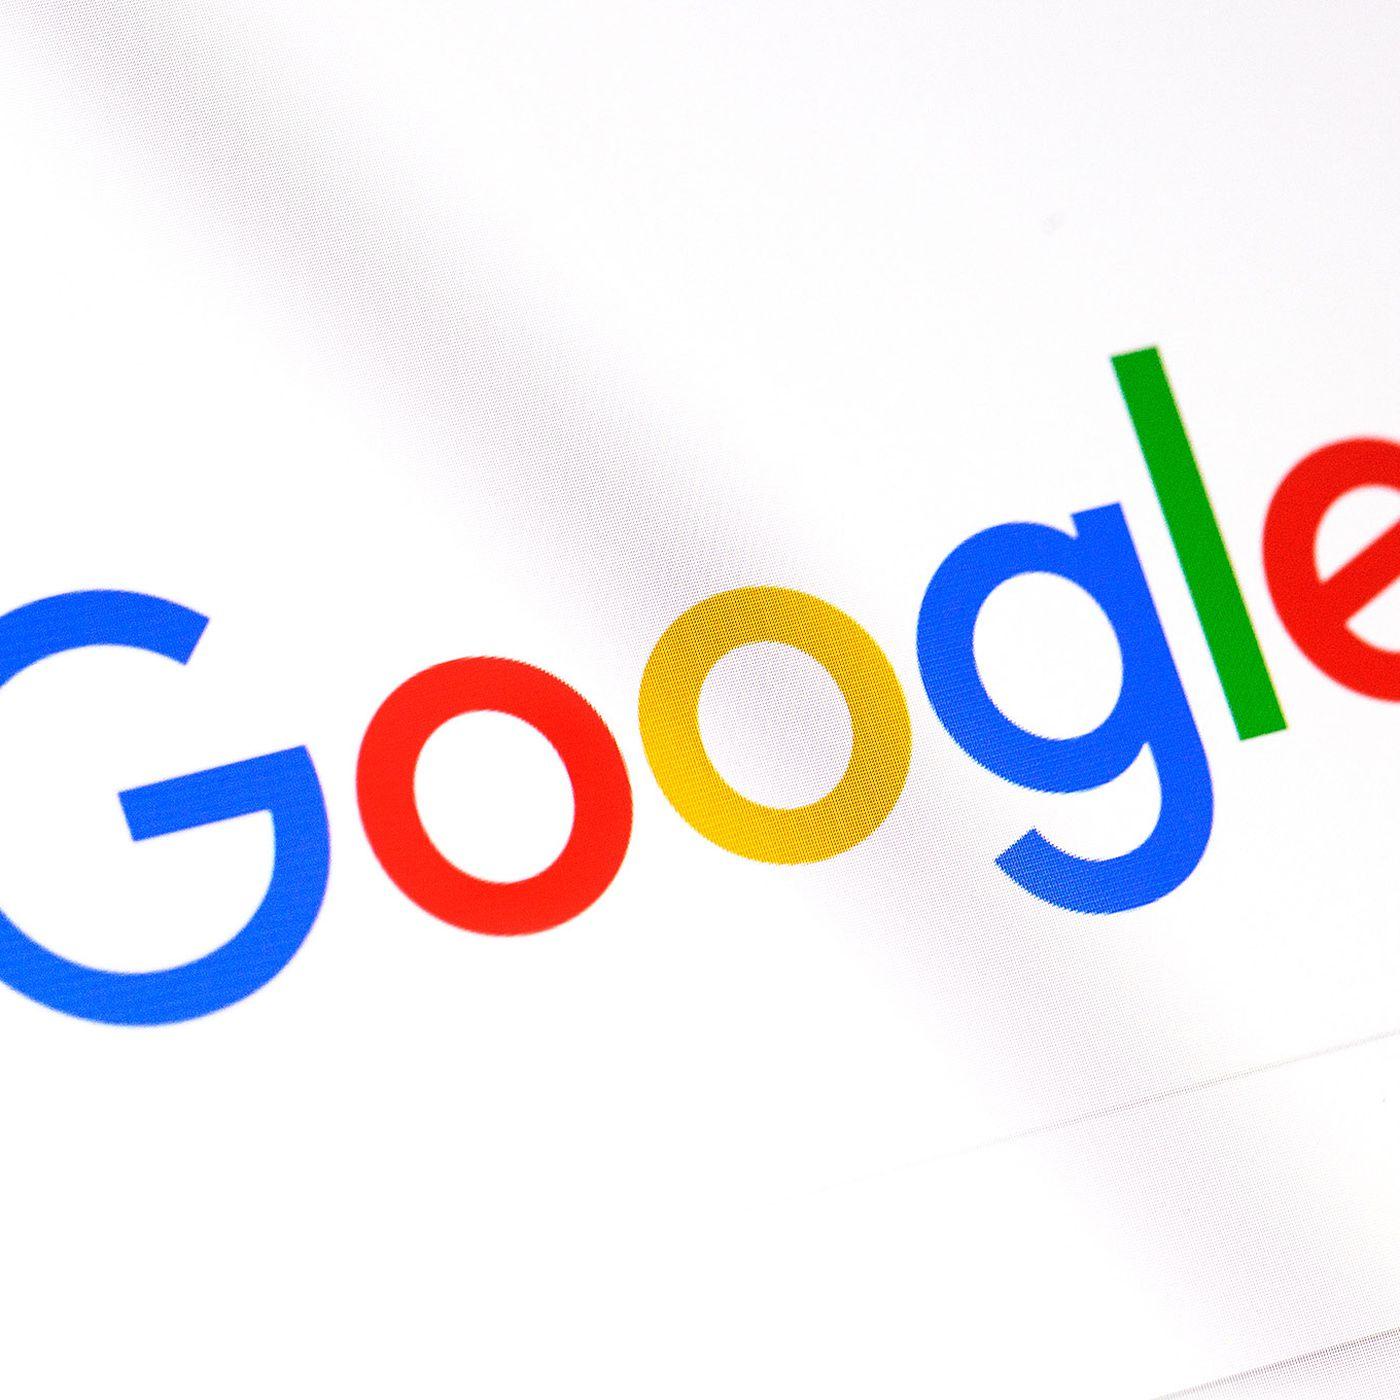 Google is shuttering its URL shortening service, goo gl - The Verge